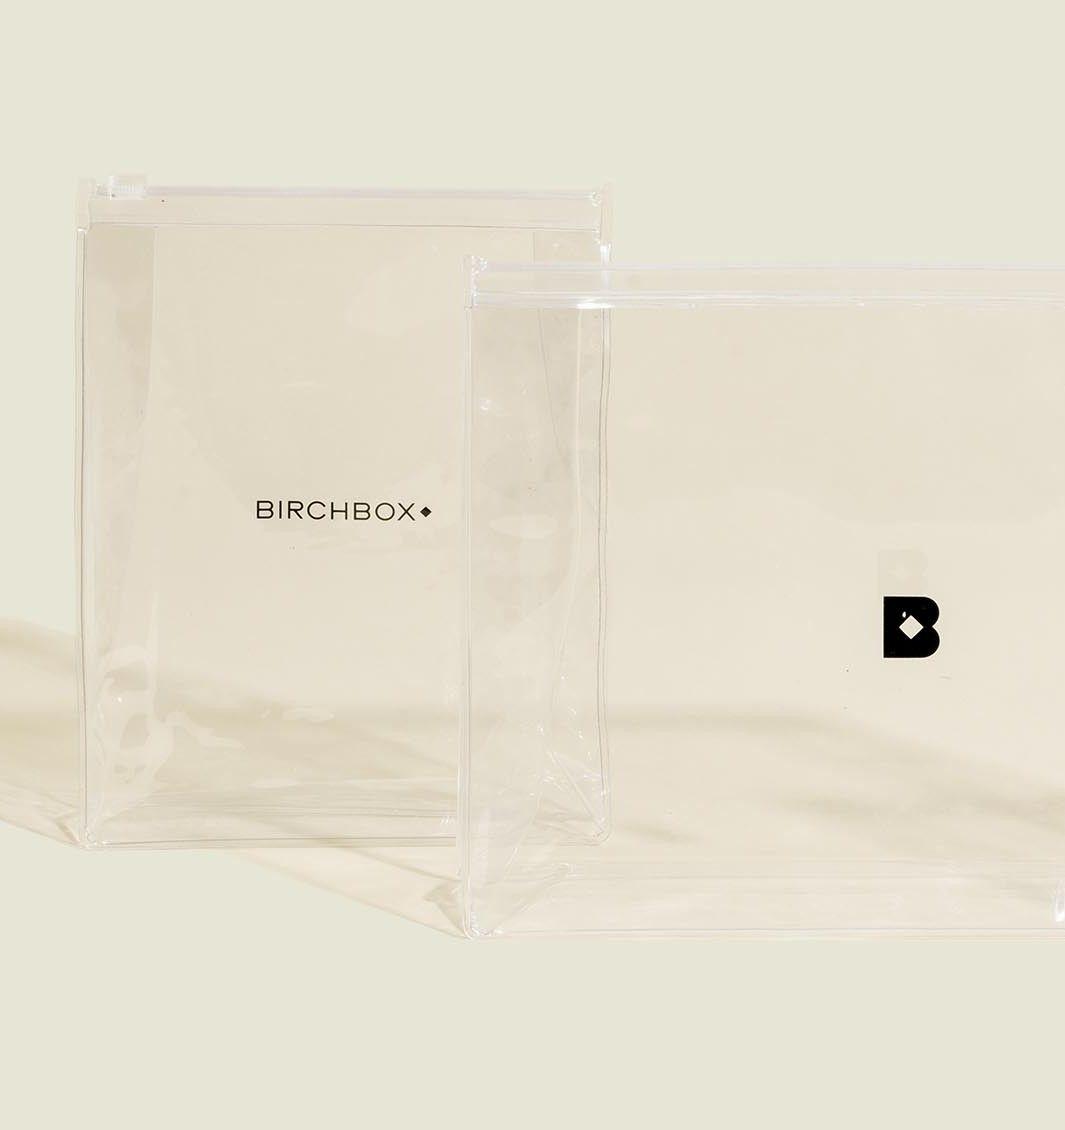 Clear ziplock bags